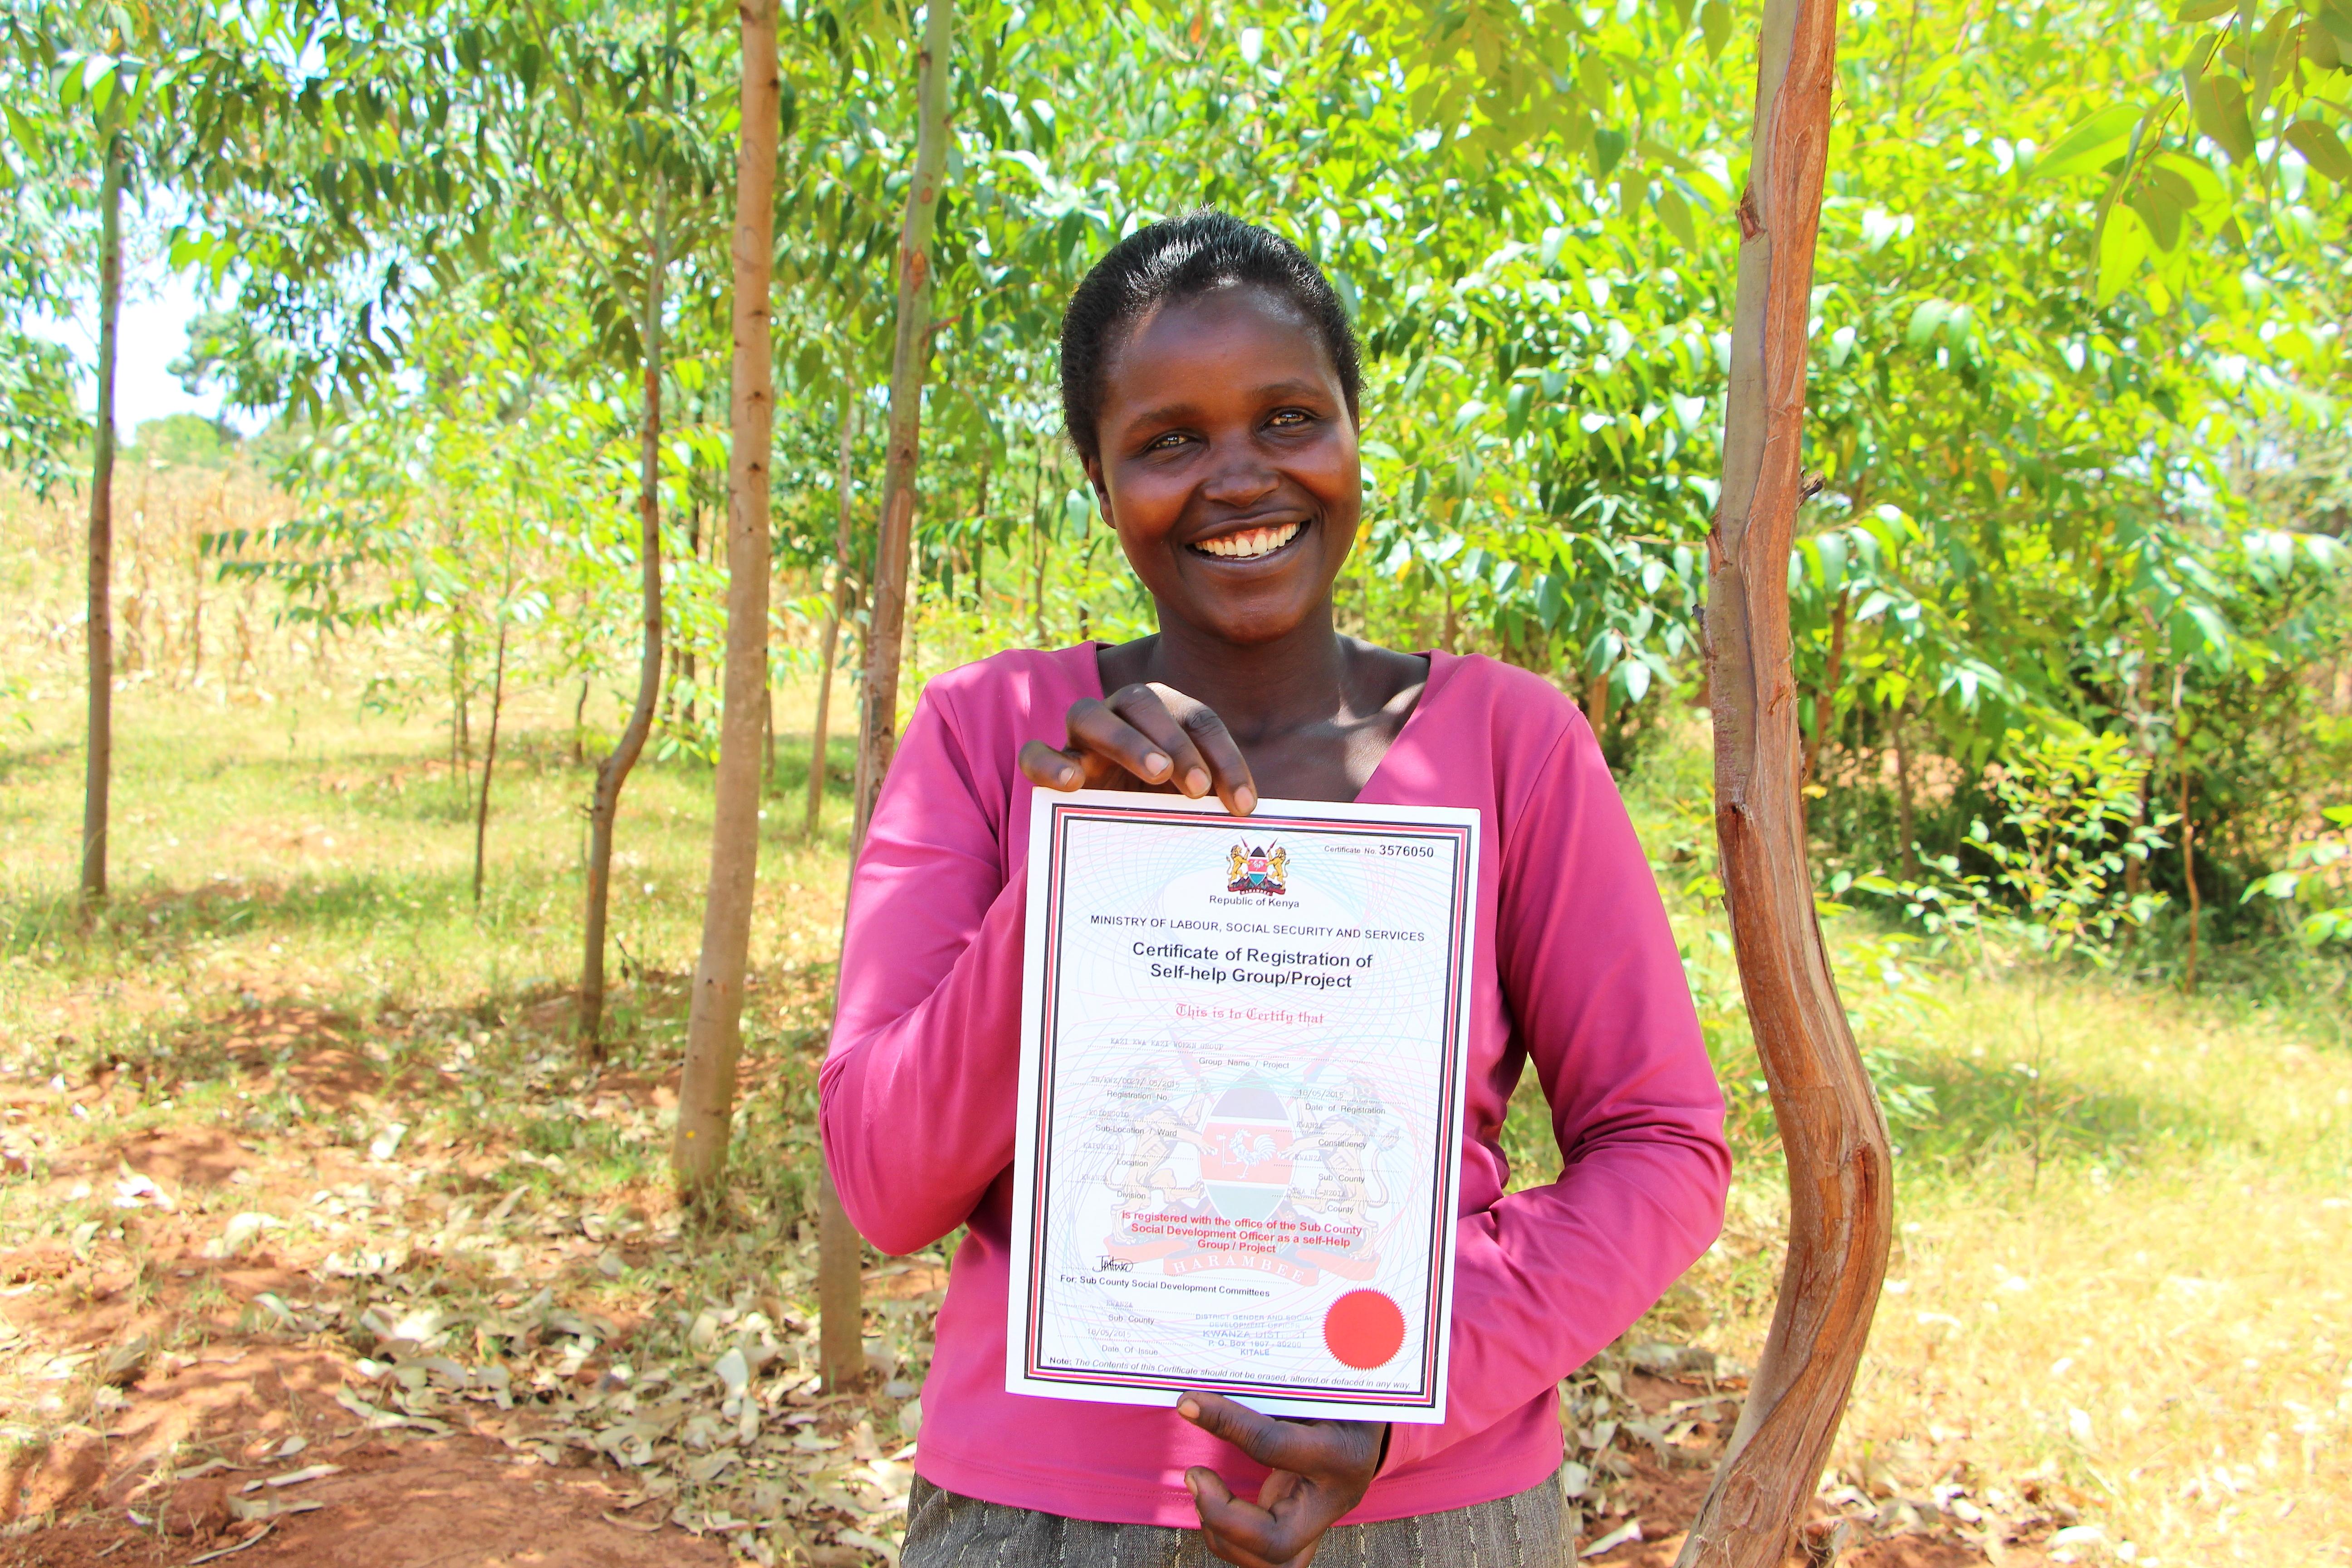 Agnes Naliaka with her Village Enterprise BSG's certificate of registration